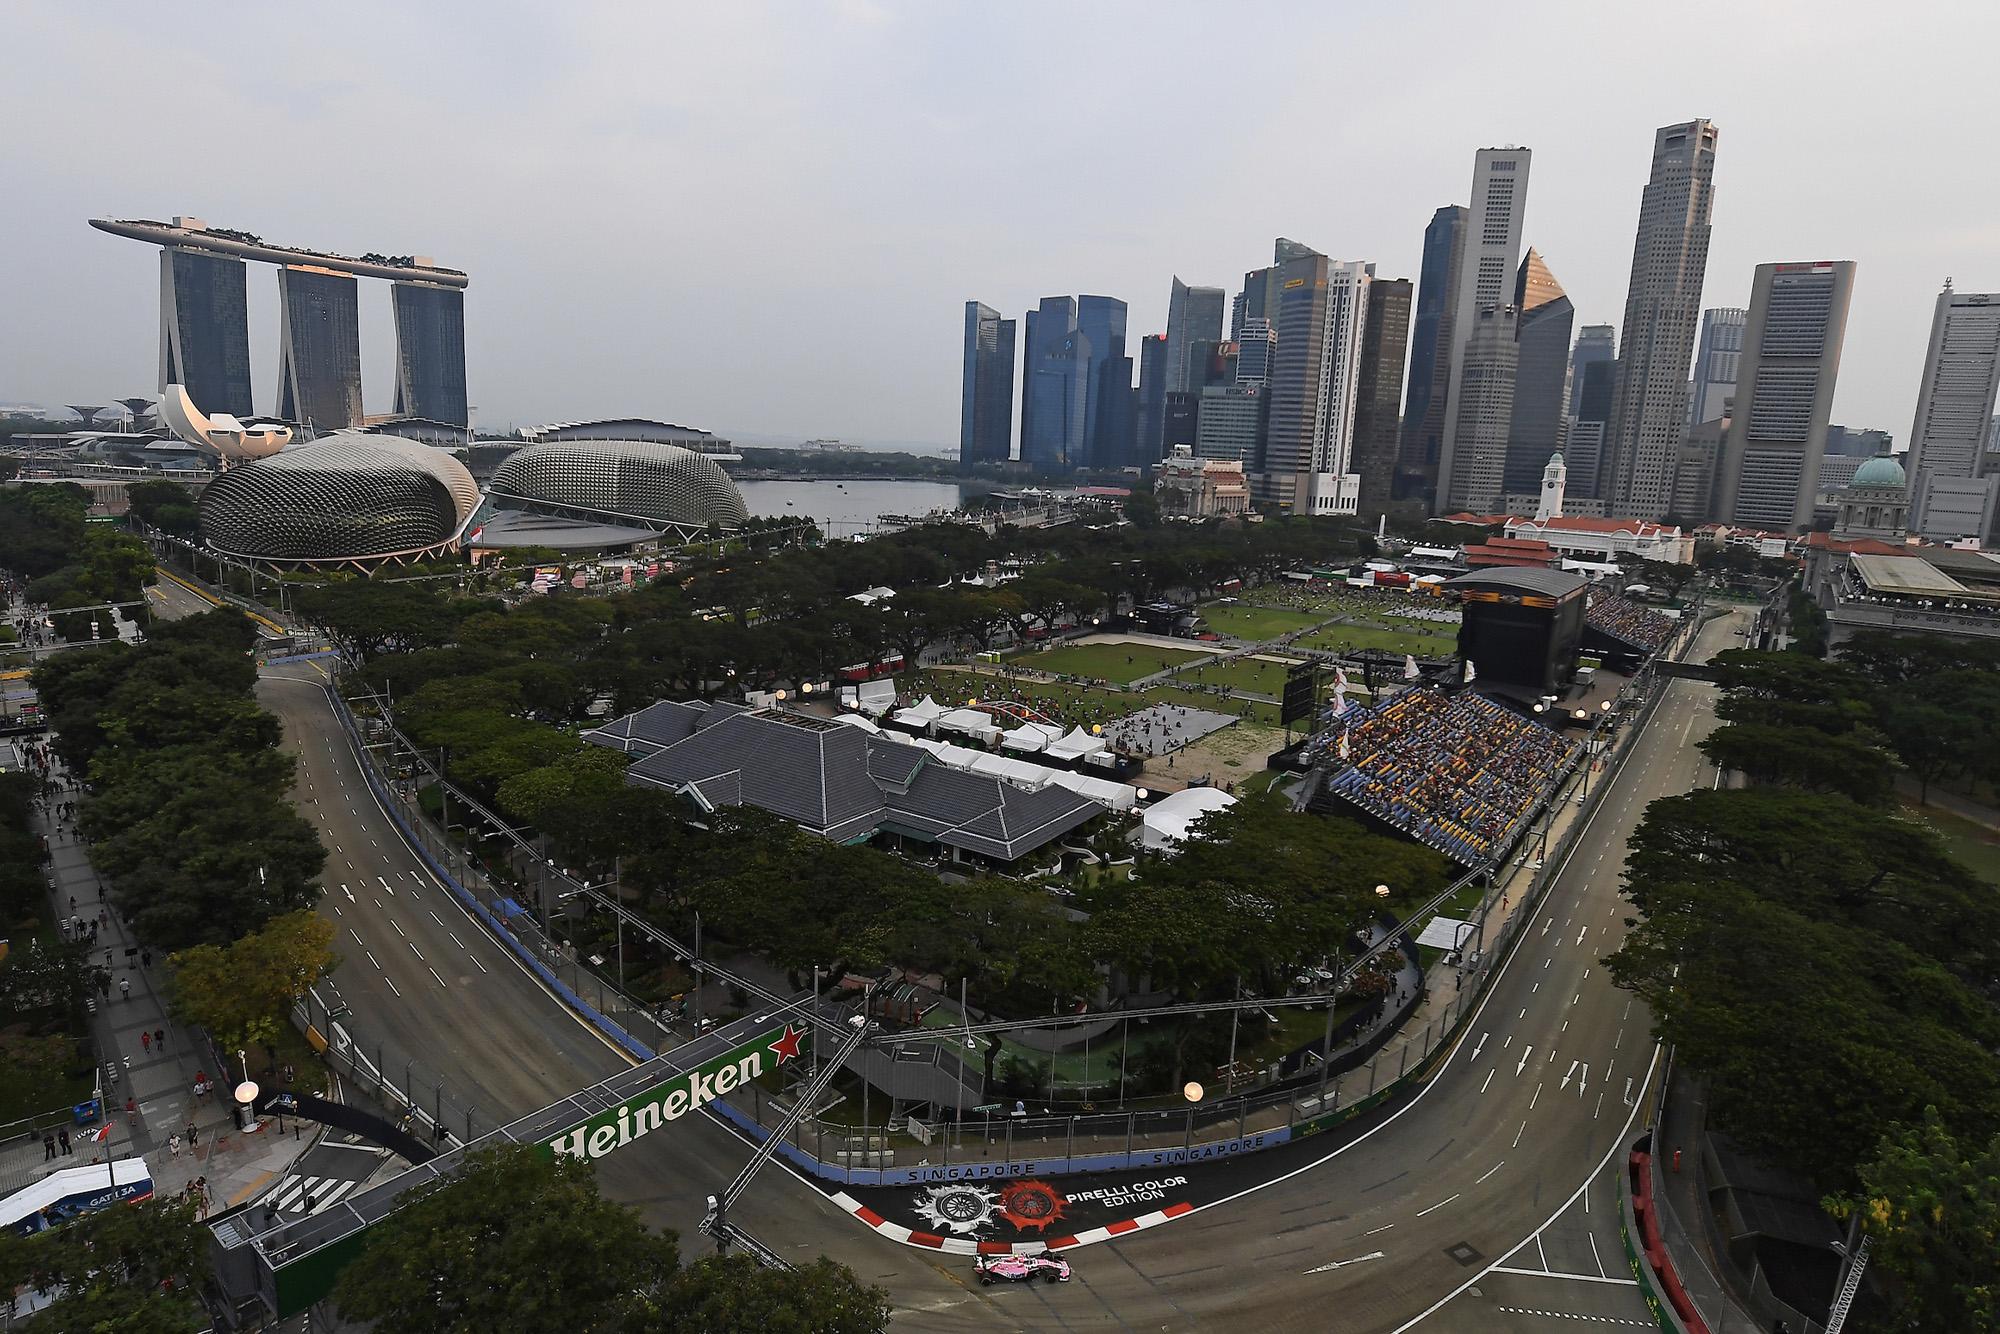 2018 View over Singapore Marina Bay circuit